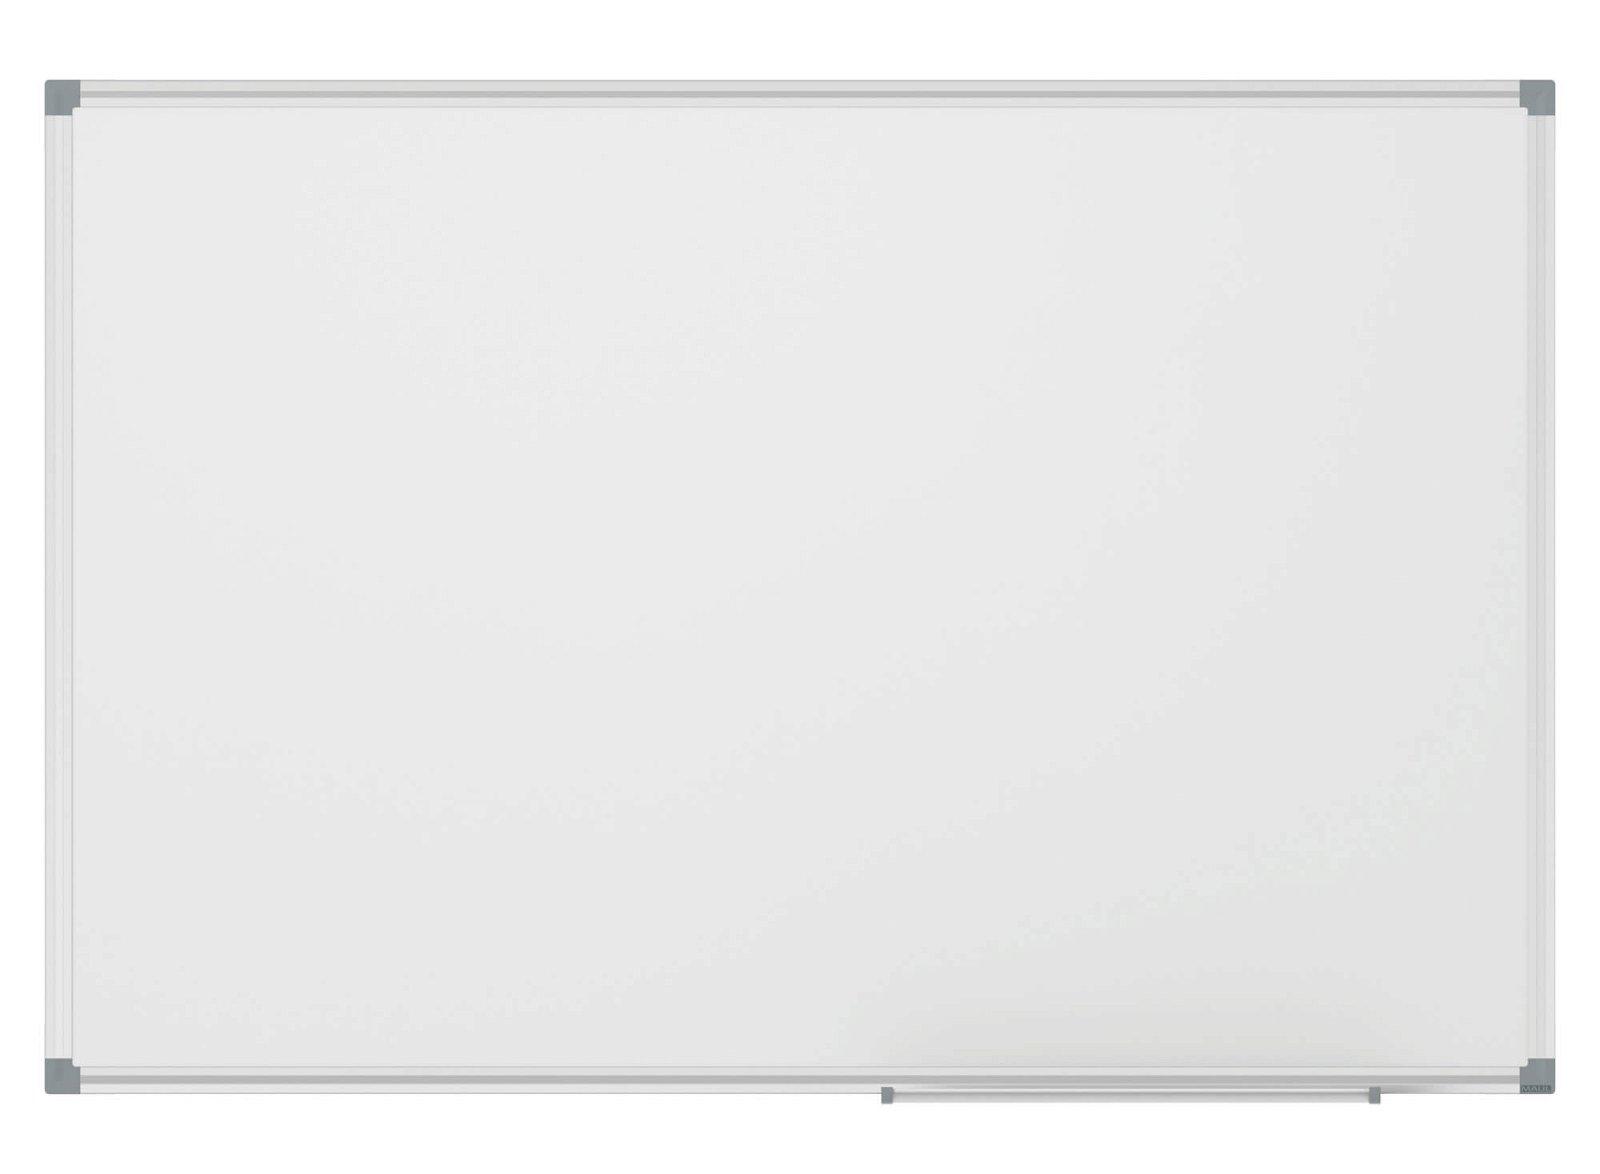 Whiteboard MAULstandard, Emaille, 120x180 cm, grau